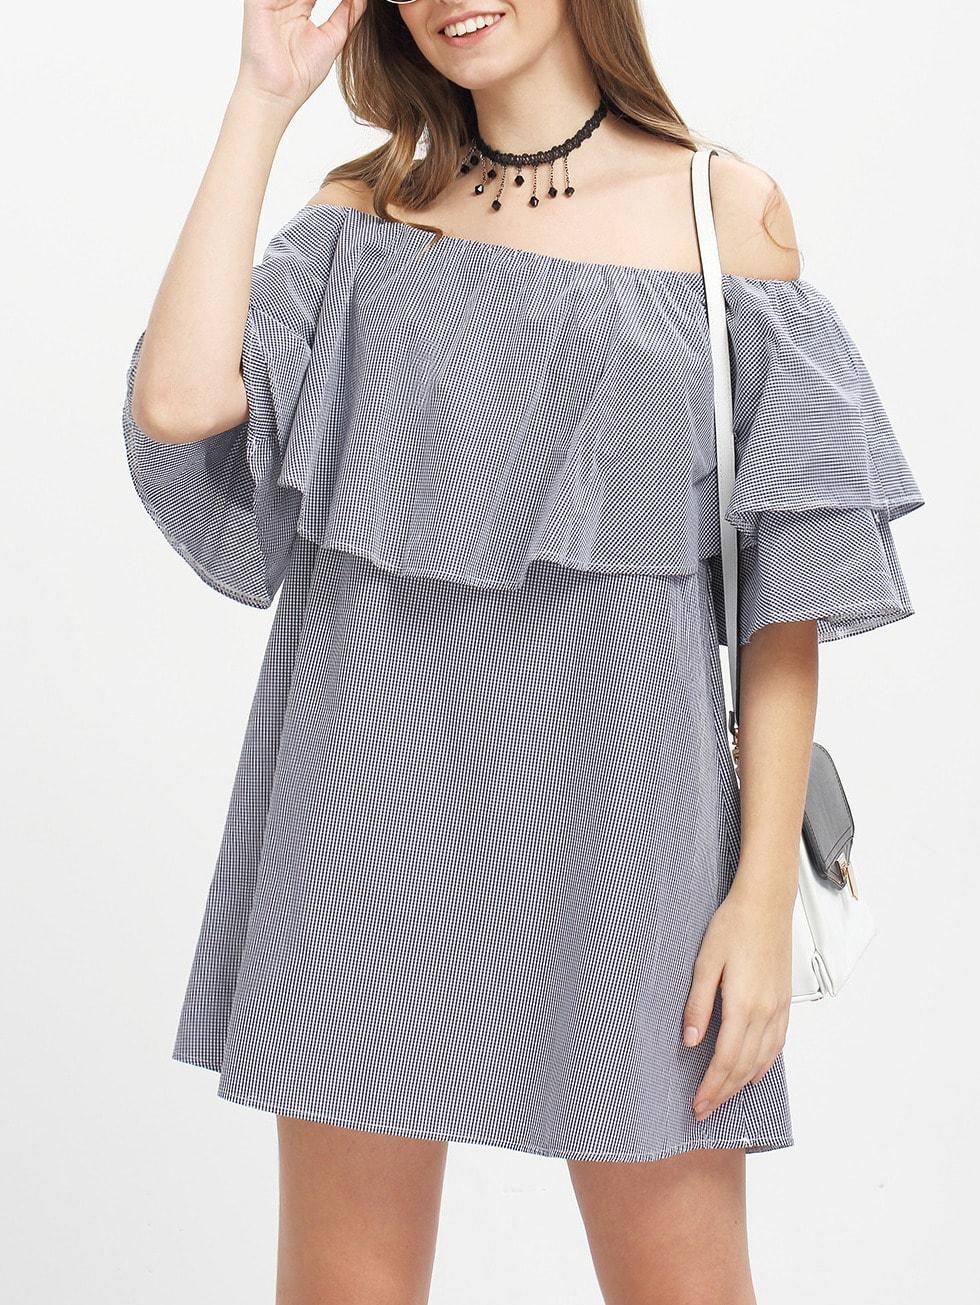 Off The Shoulder Ruffle Dress dress160324105